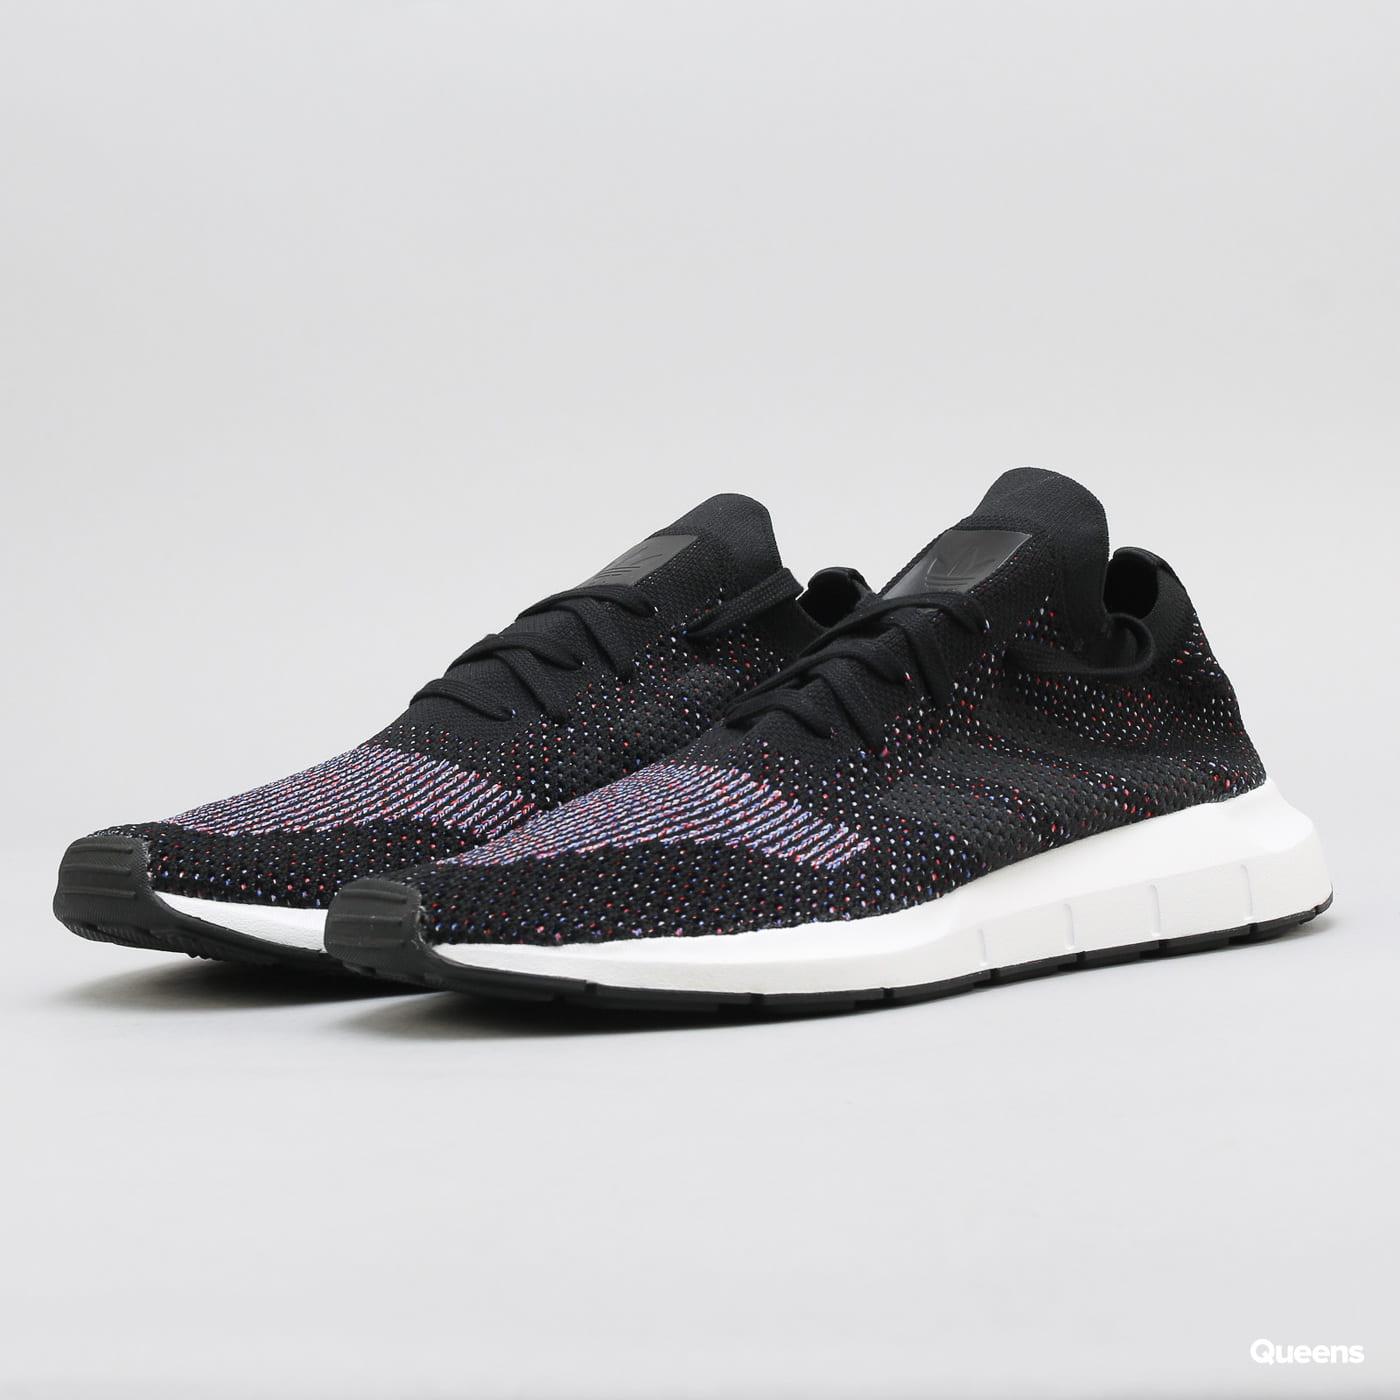 4bf91c756b0da Sneakers adidas Swift Run PK (CQ2894)– Queens 💚